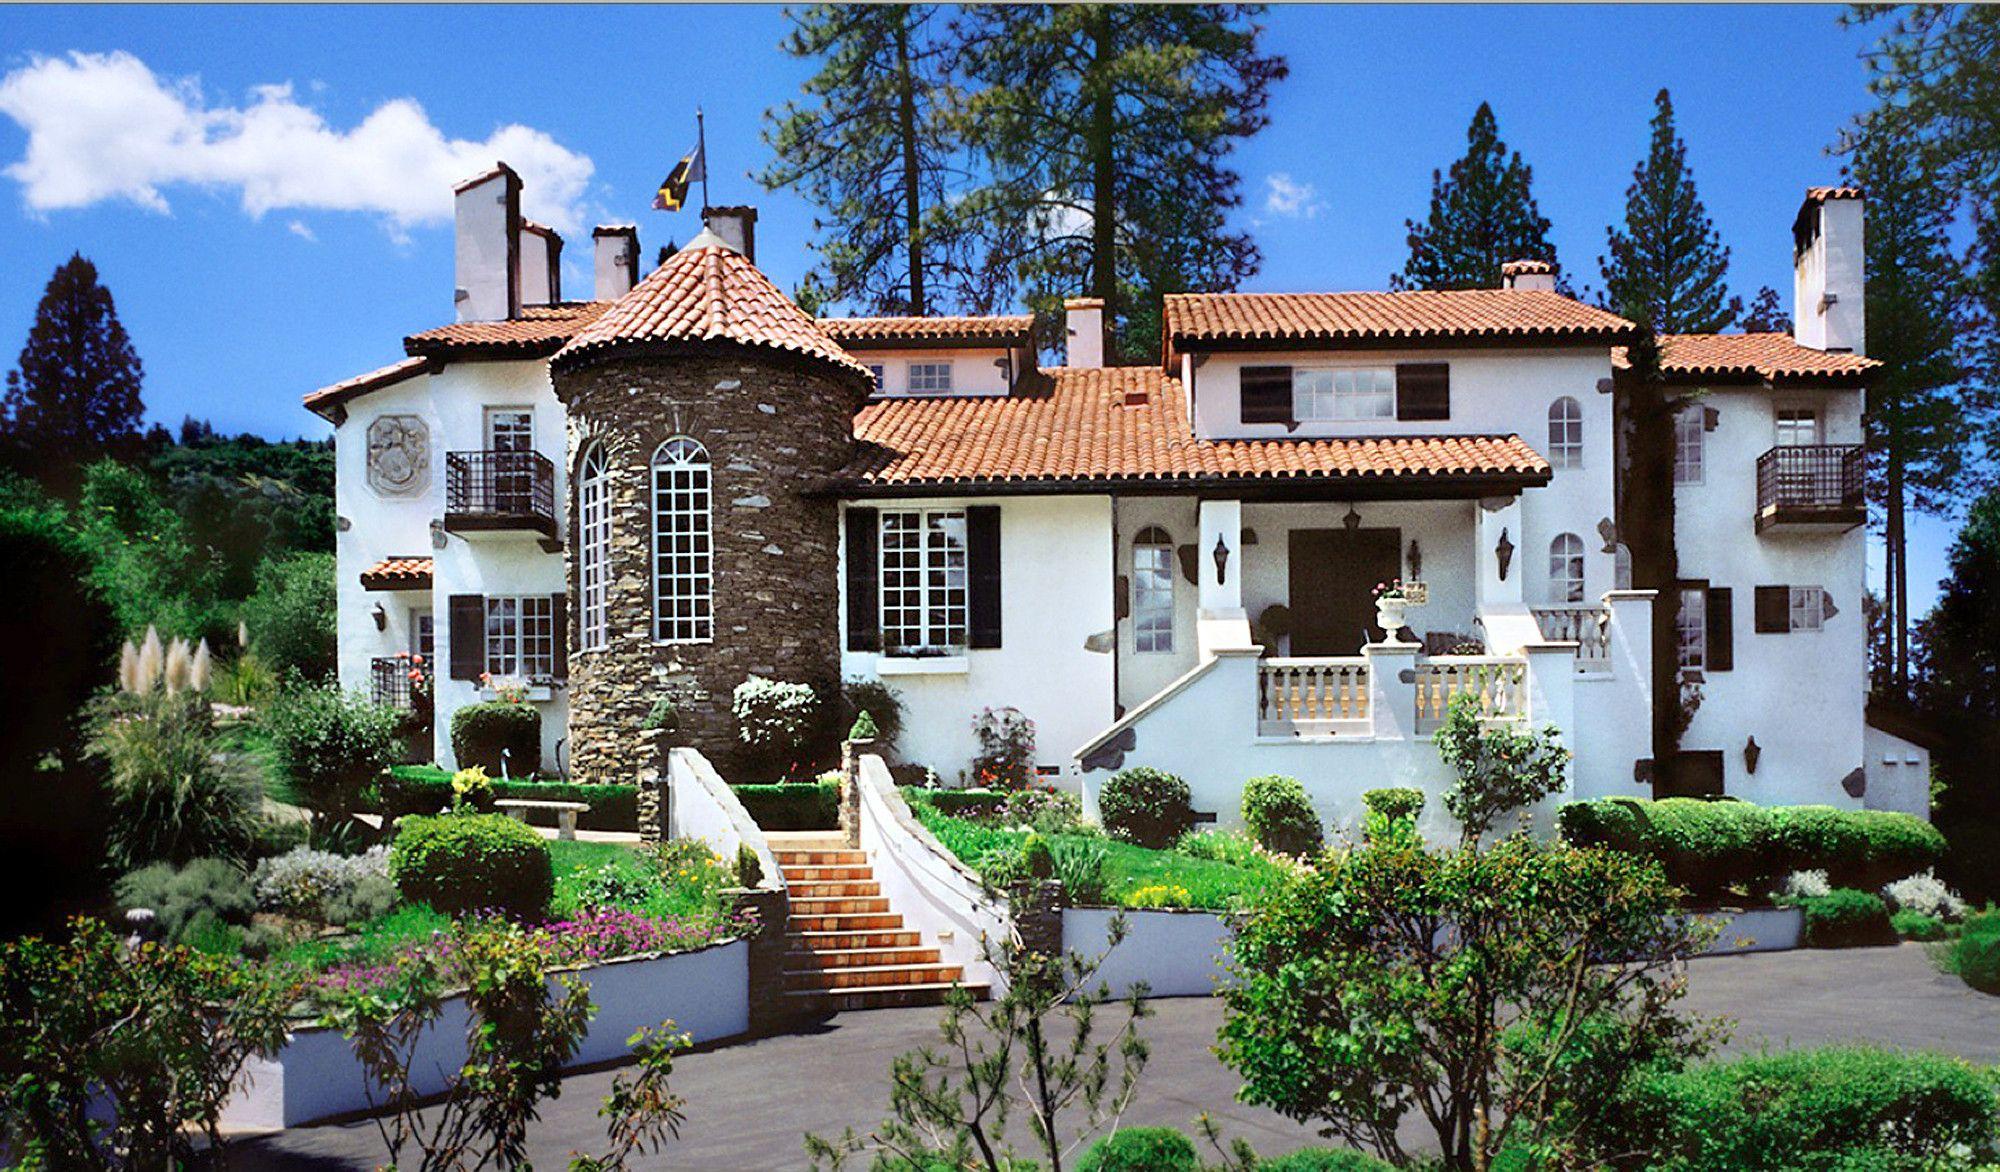 California Chateau Du Sureau Grand Del Mar Top Tripadvisor Rankings Best Weekend Getaways Yosemite San Francisco Vacation